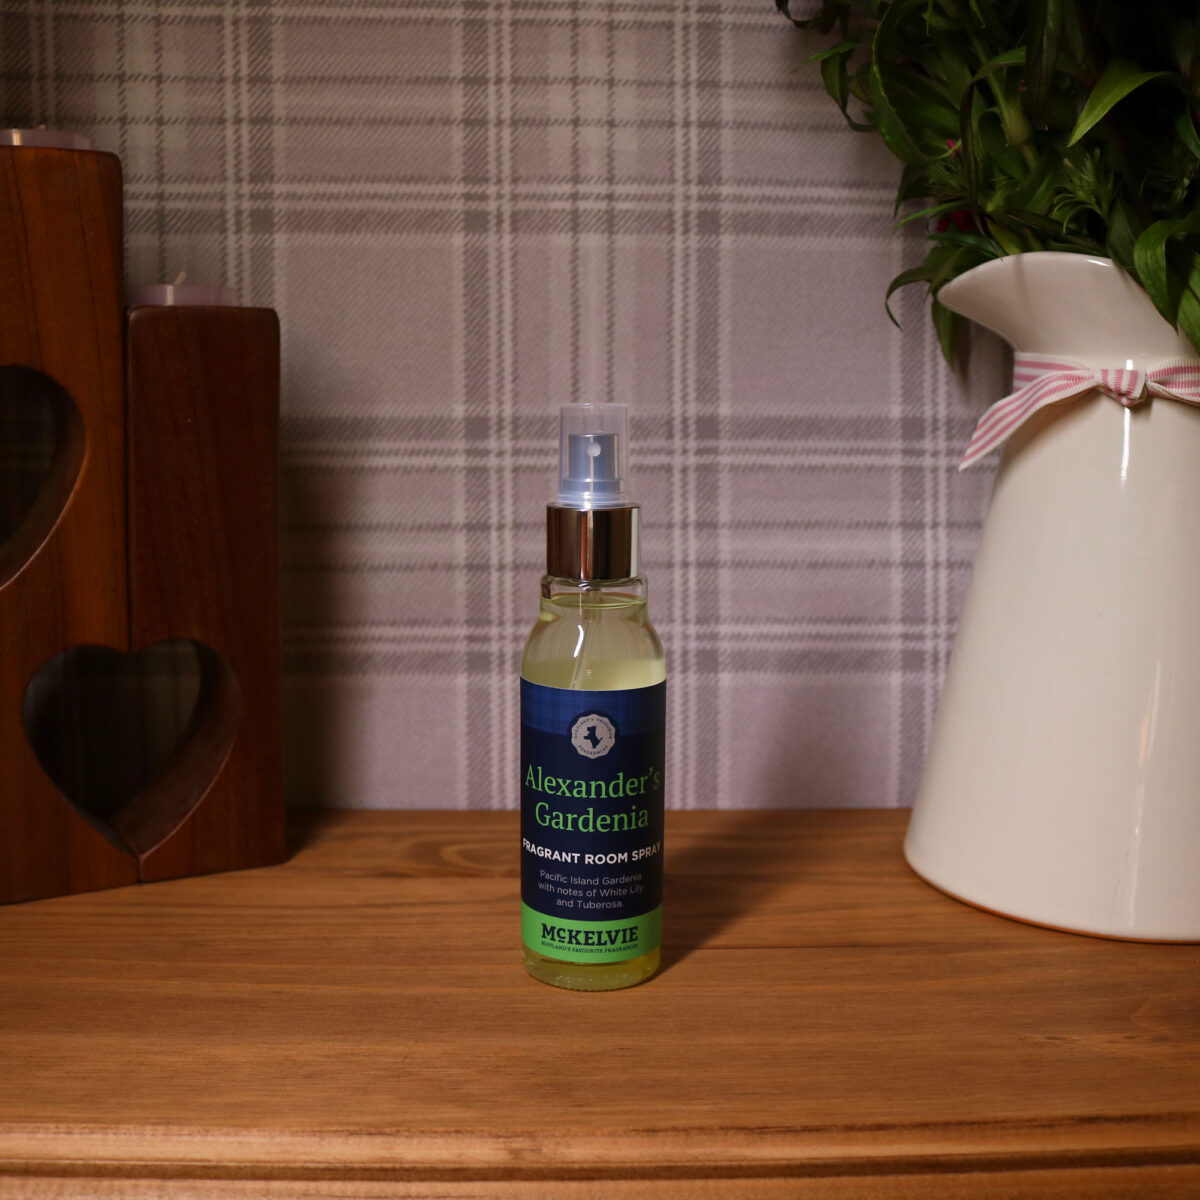 Alexanders Gardenia Fragrant Room Spray